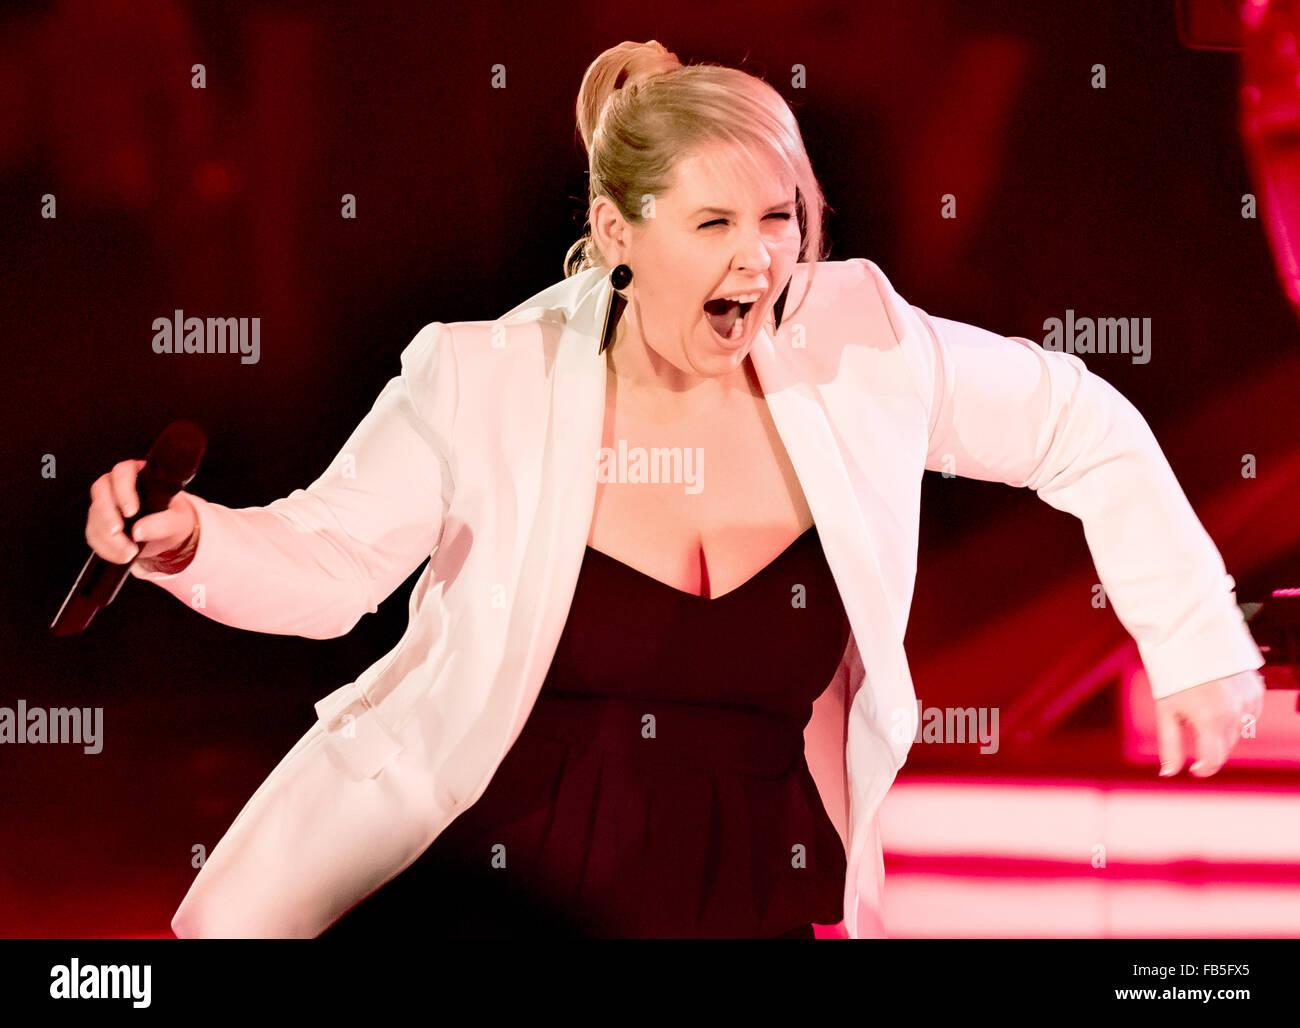 Berlin, Germany. 09th Jan, 2016. Singer Maite Kelly ...